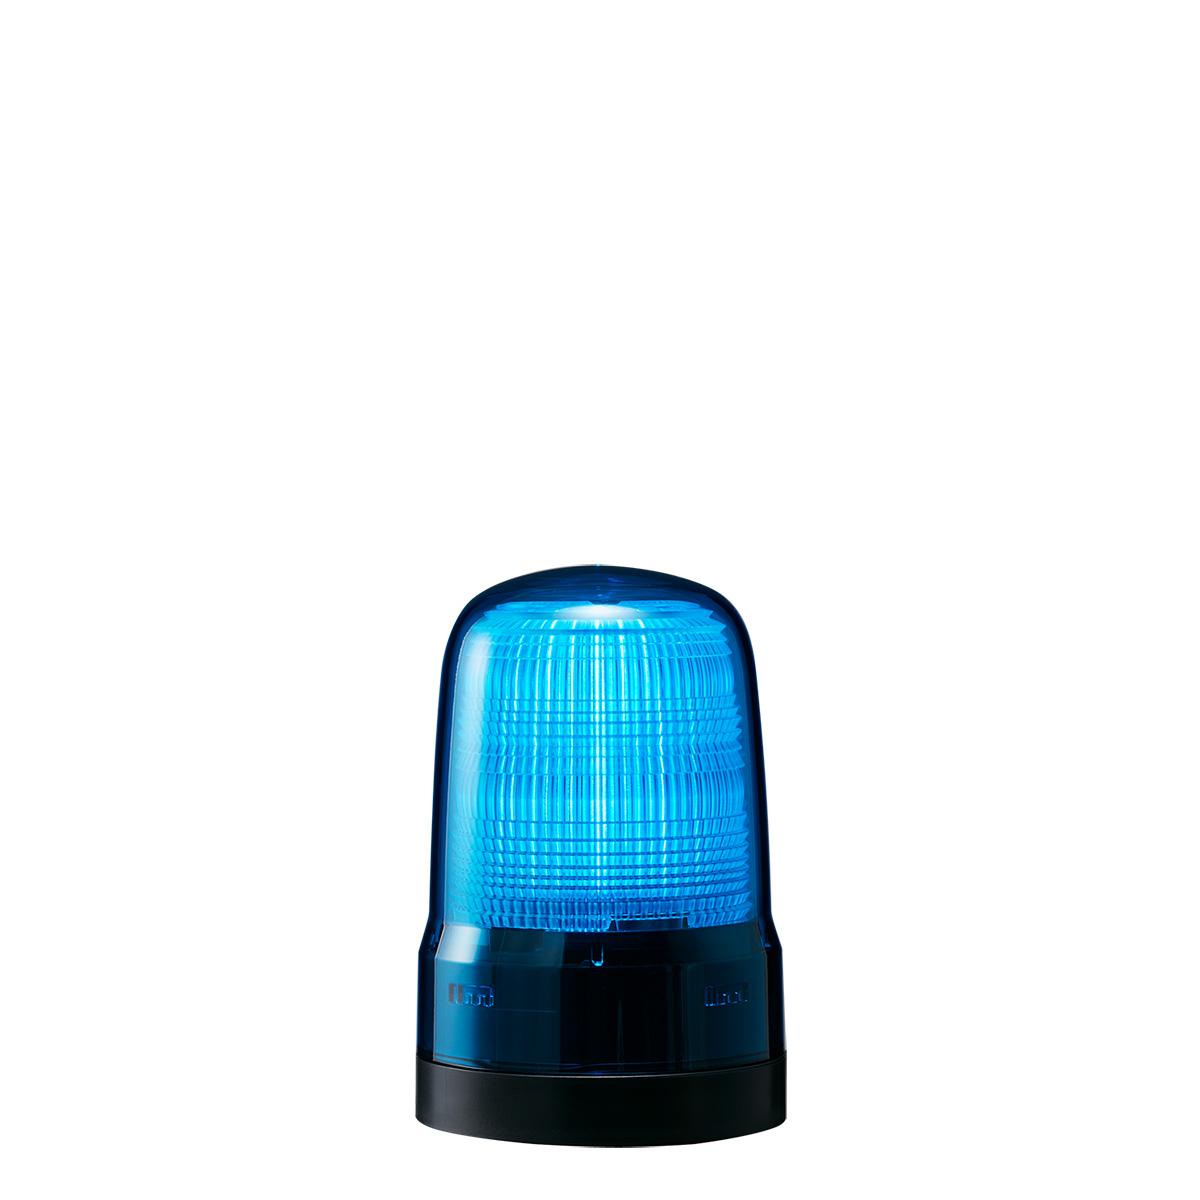 <title>送料無料 点灯 点滅 フラッシュのシンプル報知 青色灯 パトライト LED表示灯 SL 正規店 DC12~24V 2.9W φ80mm ブルー 青色 プッシュイン端子台 2点穴取付 SL08-M1KTN-B</title>